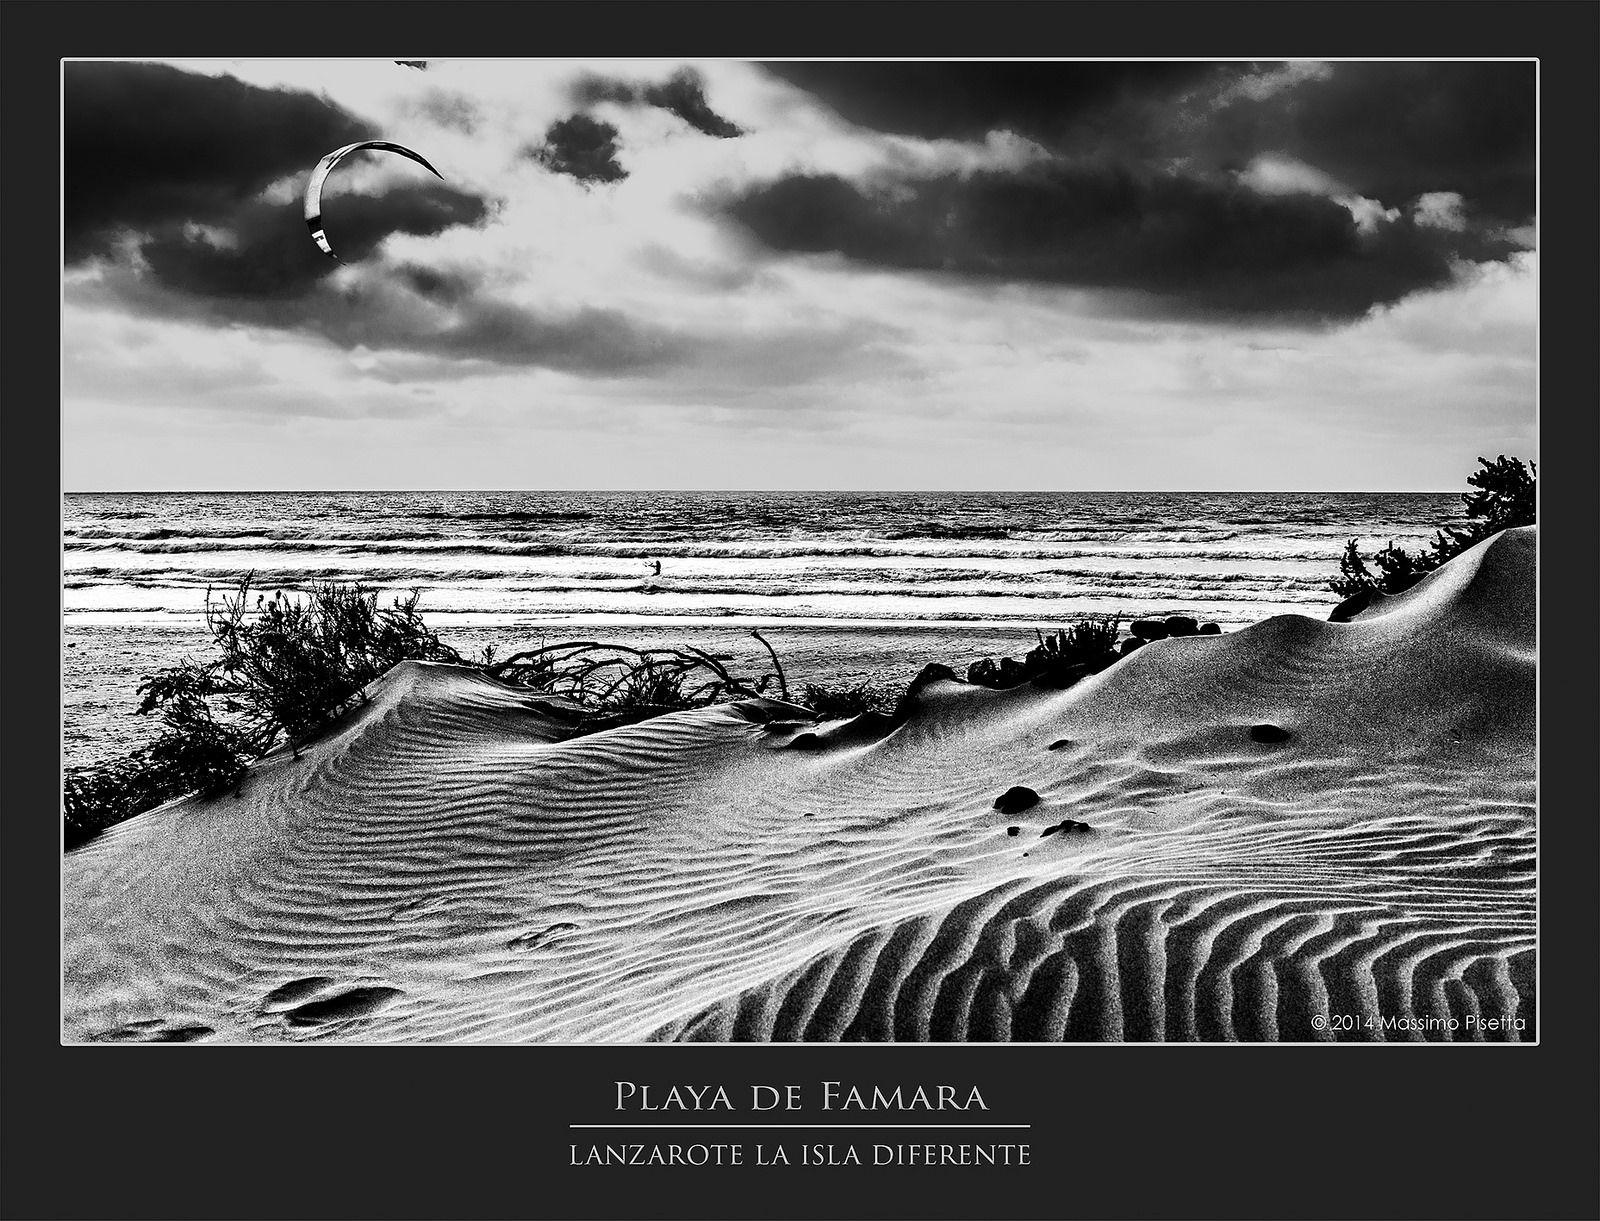 https://flic.kr/p/qwqGQR | Playa de Famara @Lanzarote | Playa de Famara @Lanzarote BW; FF; 24-105mm @45,0mm; 1/160 sec.; f/10,0; ISO 200 ©2014 Massimo Pisetta Photography